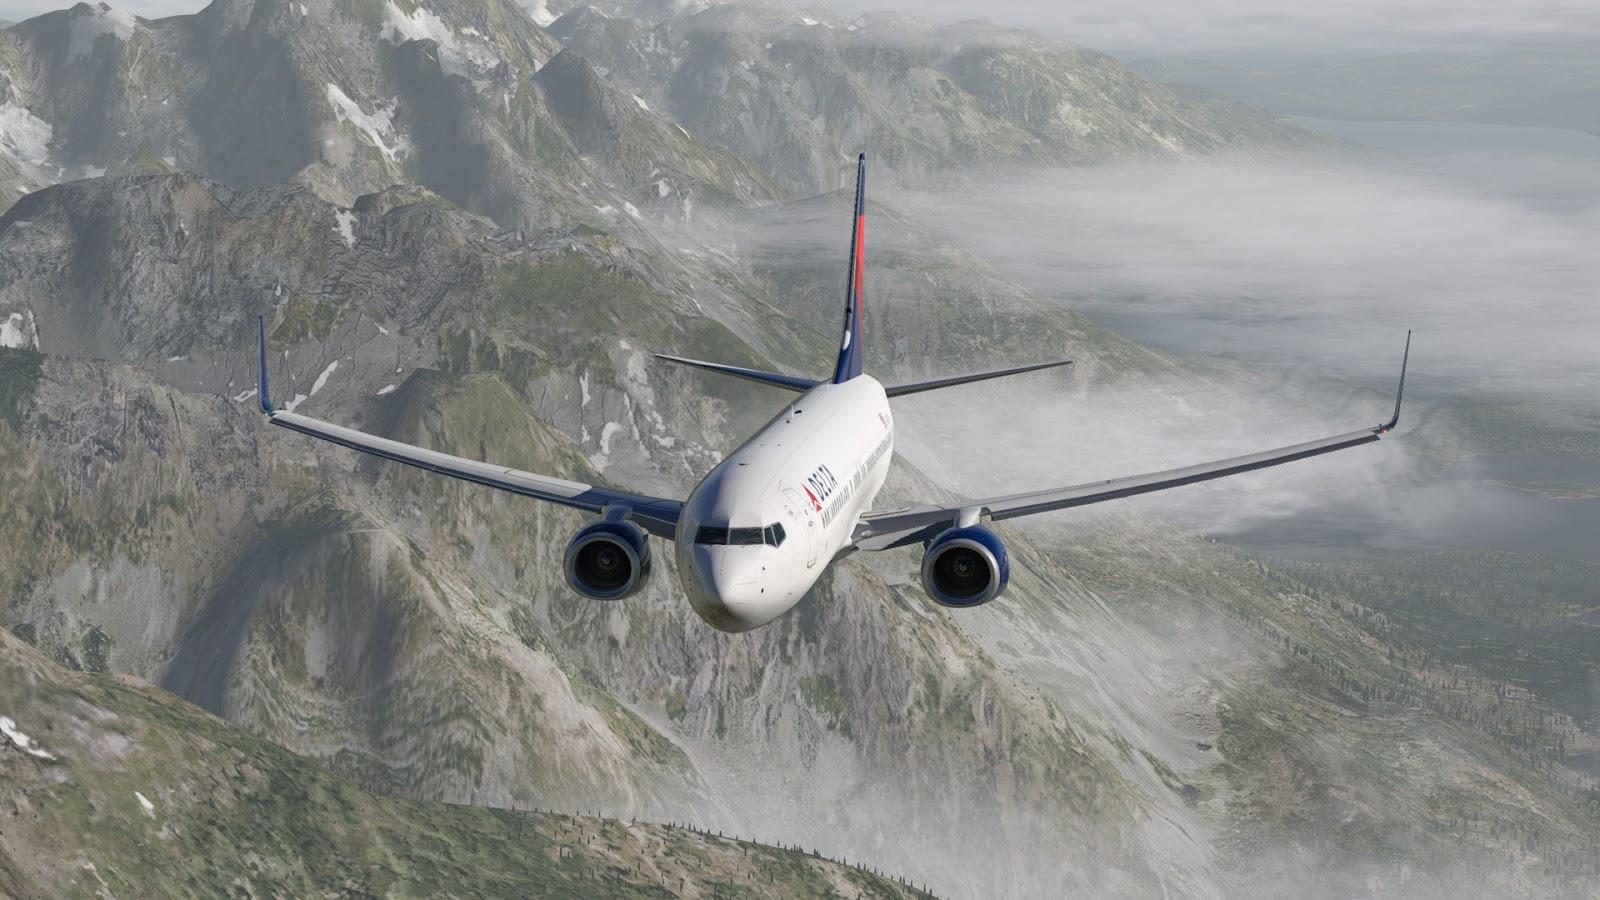 X-Plane 11 ESPAÑOL PC Full + Global Scenery DLC (CODEX) + REPACK 13 DVD5 (JPW) 4